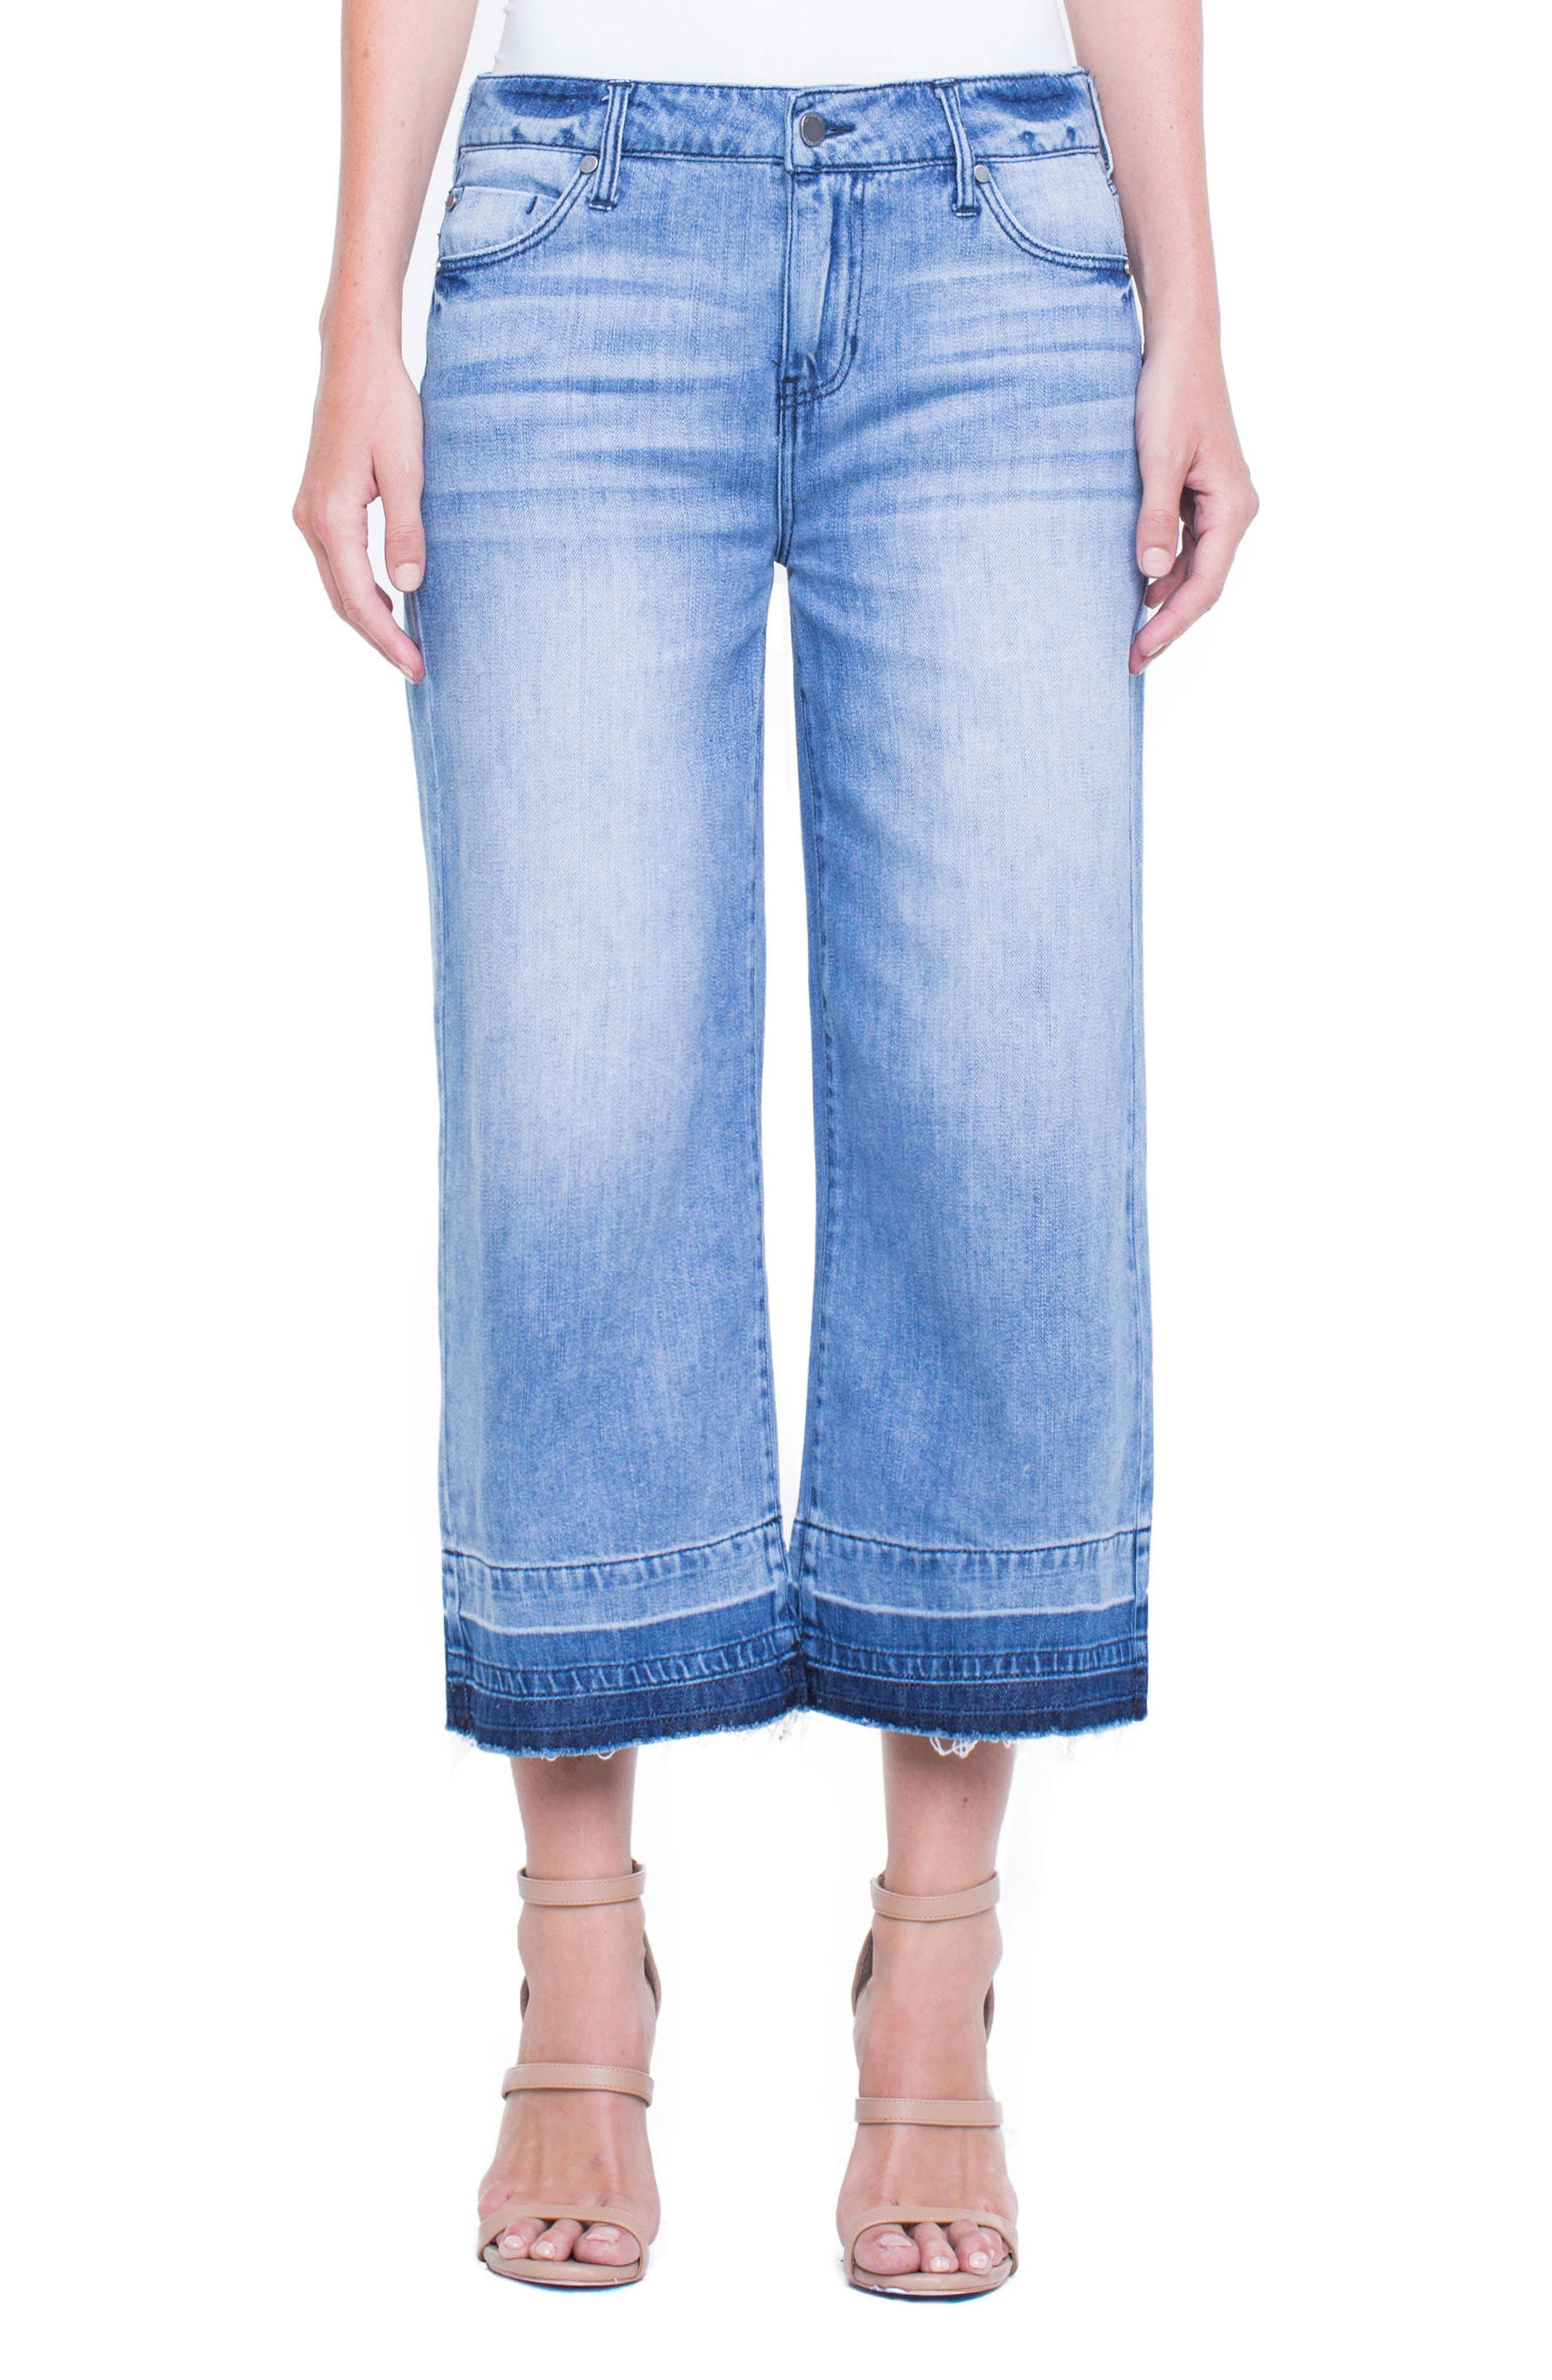 Liverpool Jeans Company Release Hem Wide Crop Jeans (Denmark Grind)